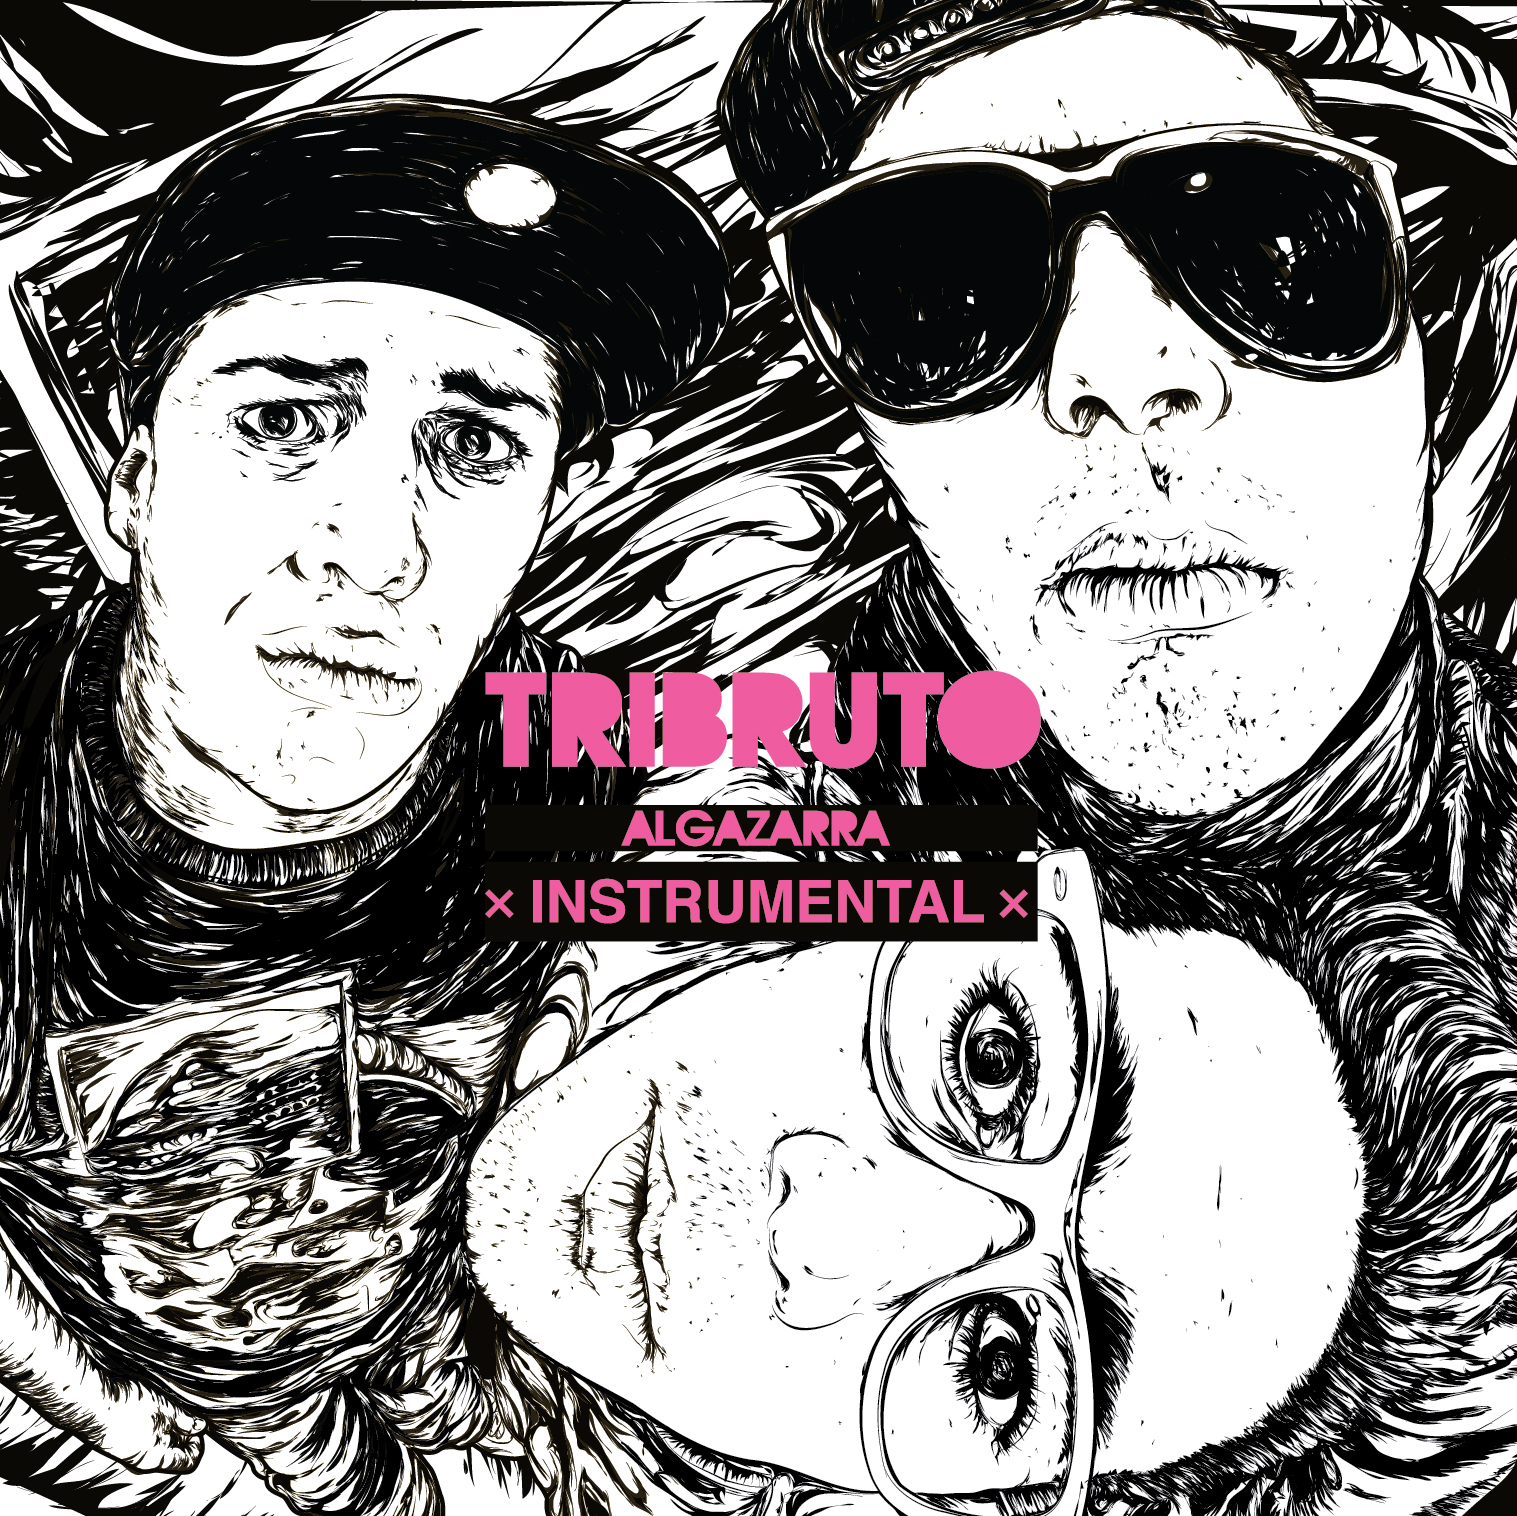 Tribruto - Algazarra Instrumental